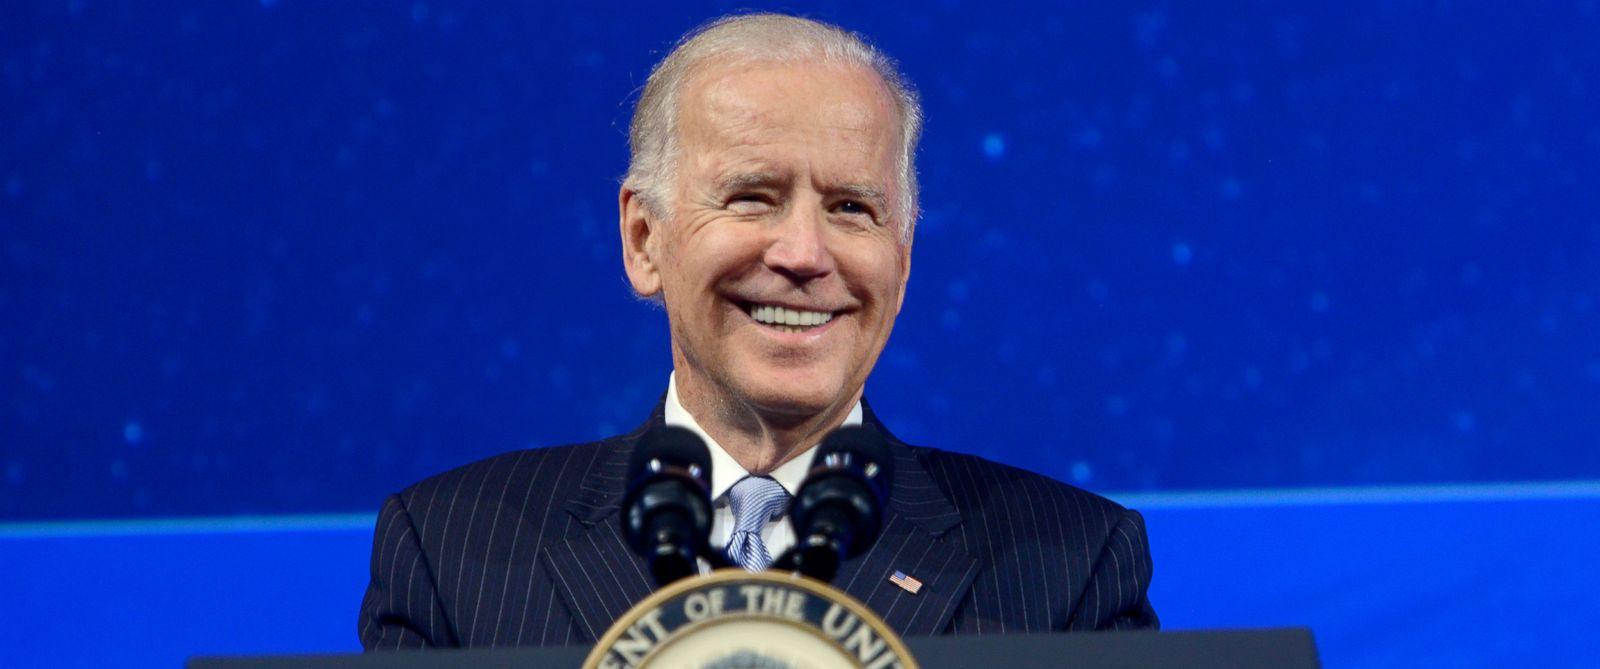 PHOTO: Vice President Joe Biden speaks on stage during the 2015 Concordia Summit at Grand Hyatt New York on Oct. 1, 2015 in New York.